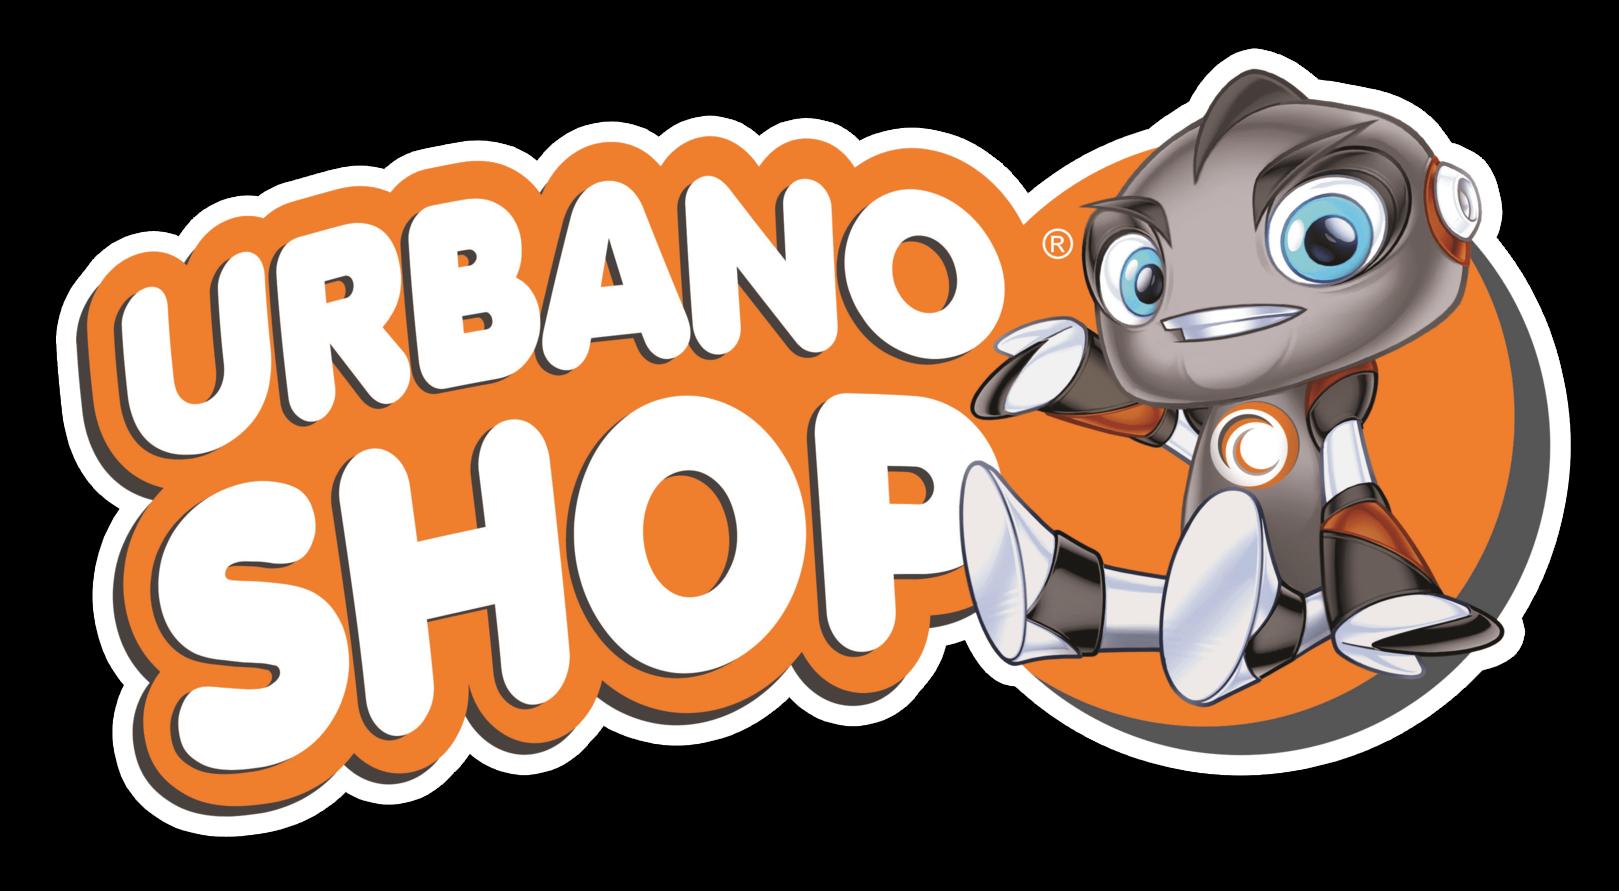 UrbanoShop